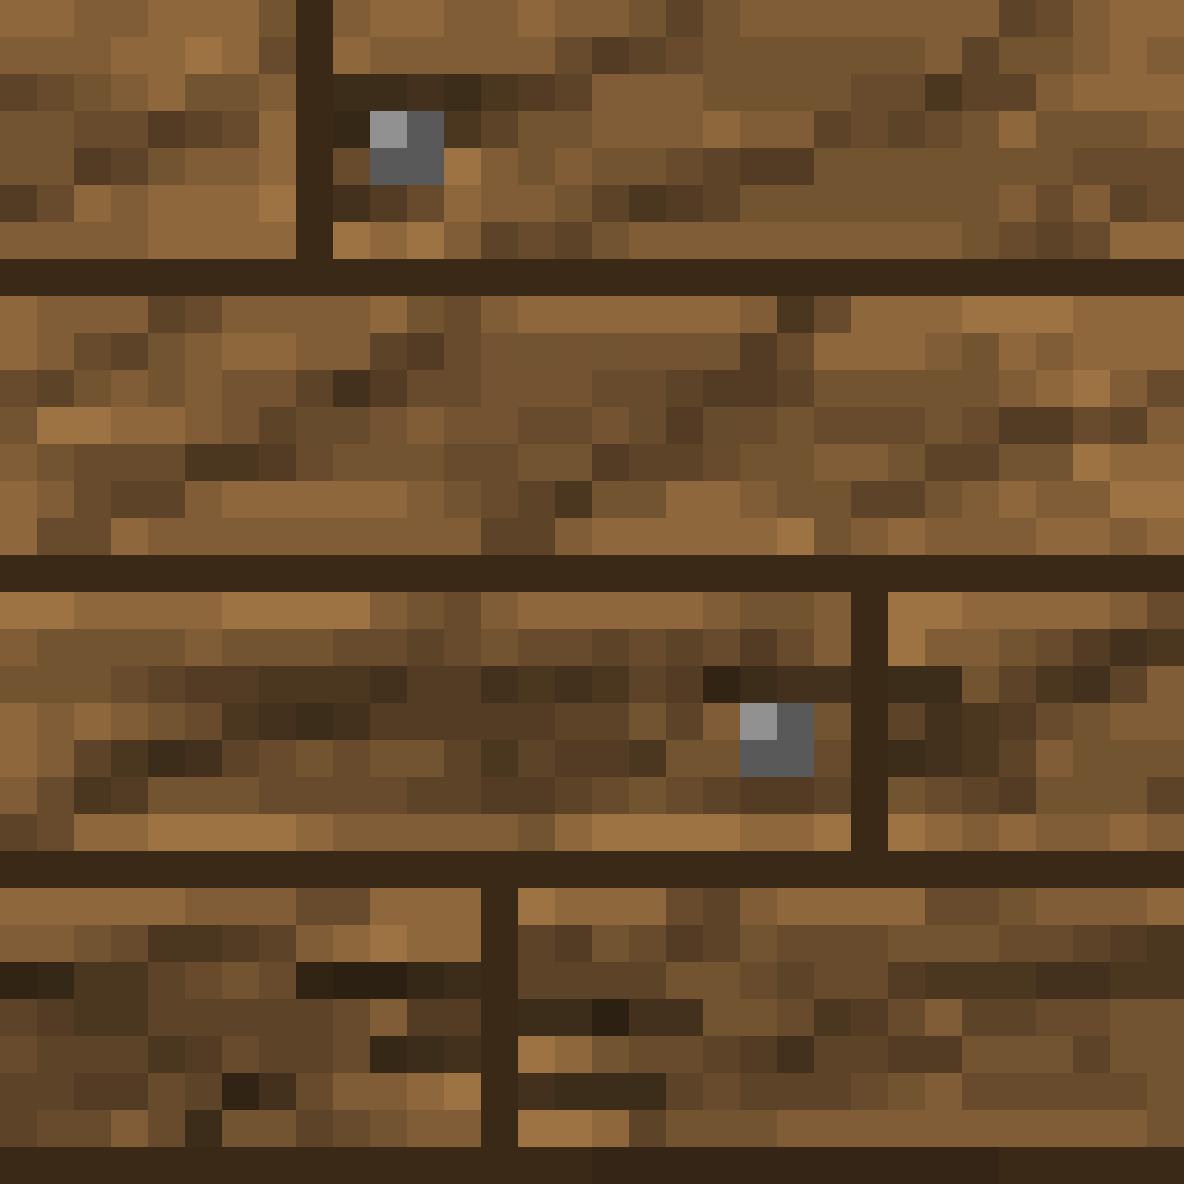 майнкрафт с деревяннымт текстурами #3